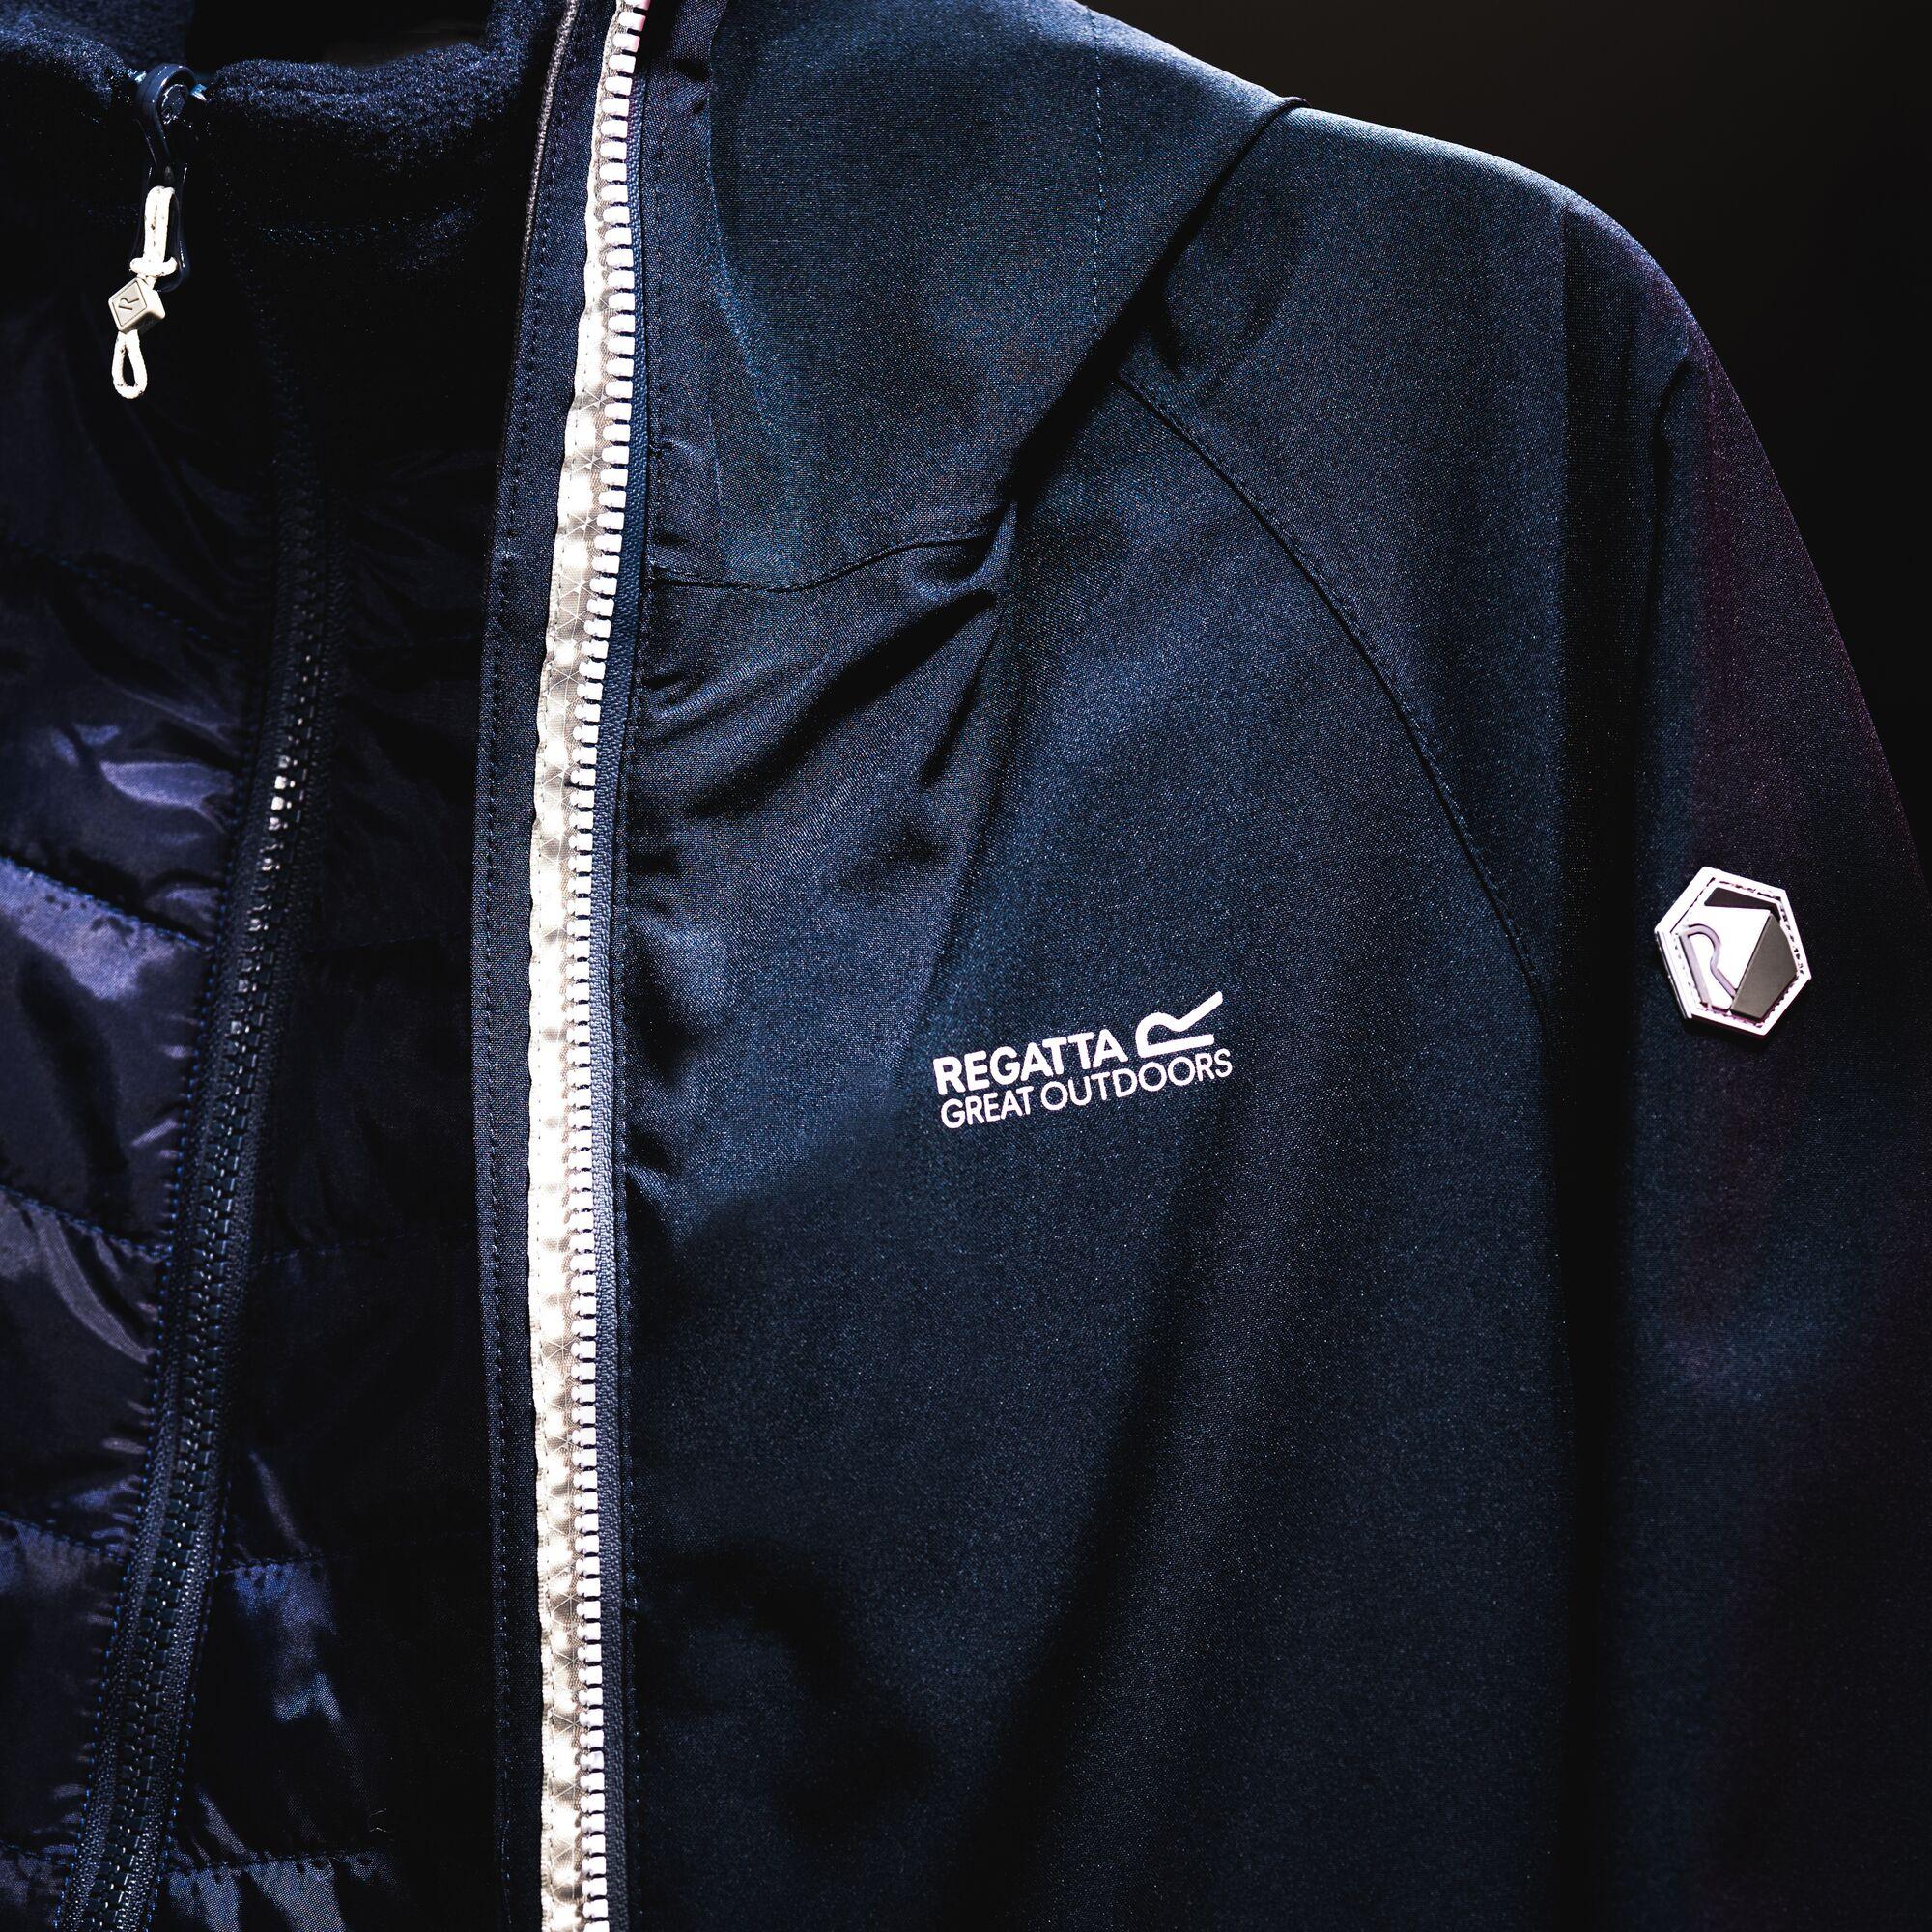 Waterproof Jacket with taped seams